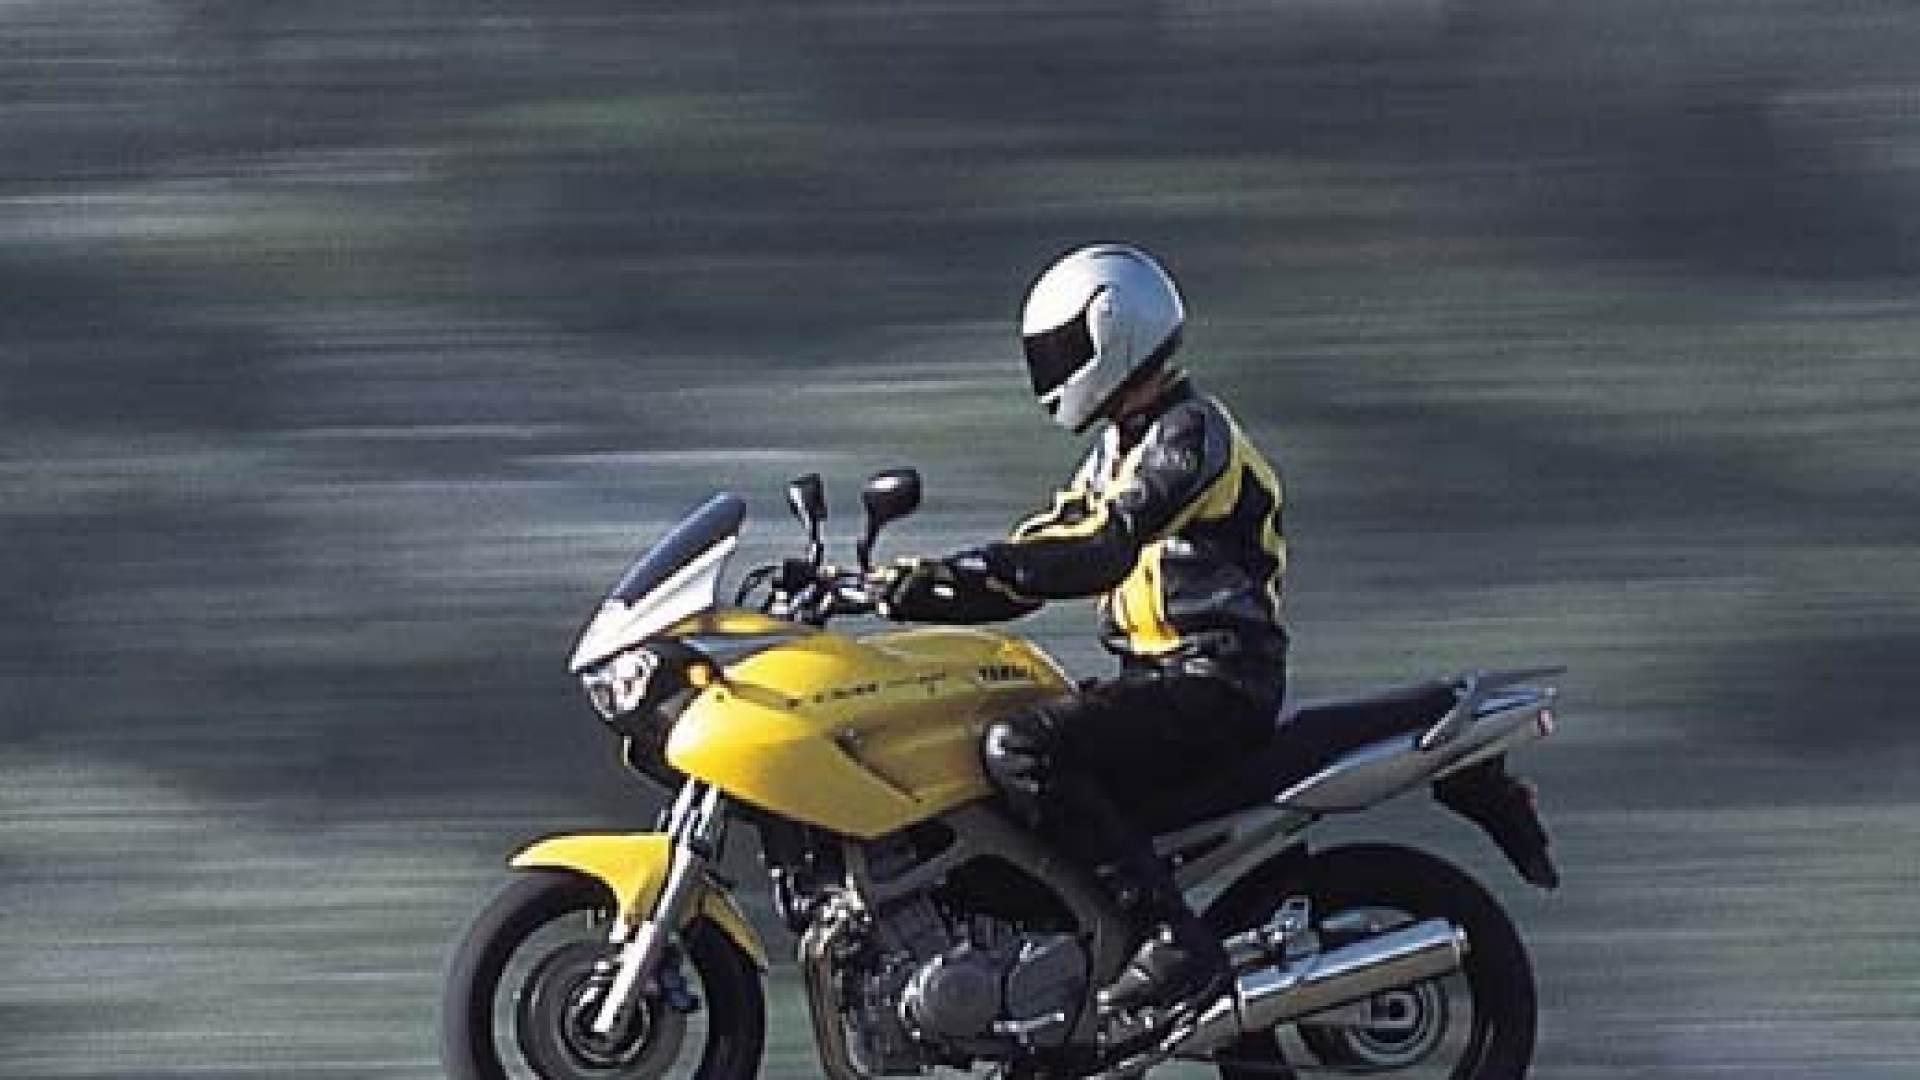 Тест-драйв мотоцикла Yamaha TDM850